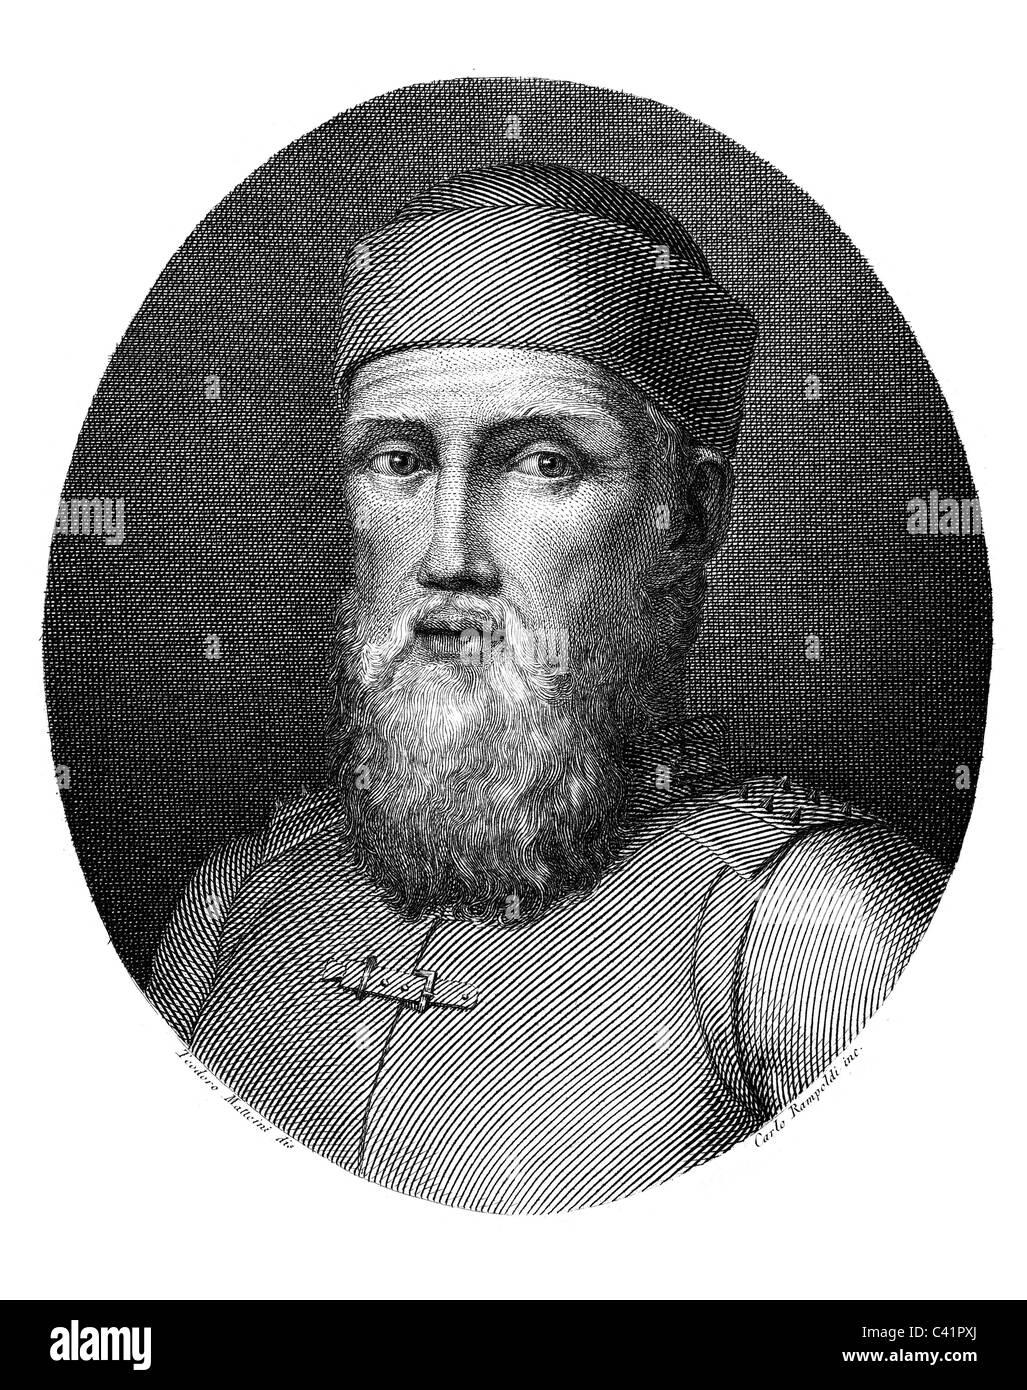 Pisani, Vettor, 1324 - 1380, Venetian  admiral, portrait, copper engraving by Carlo Rampoldi, after Teodore Matteini, - Stock Image